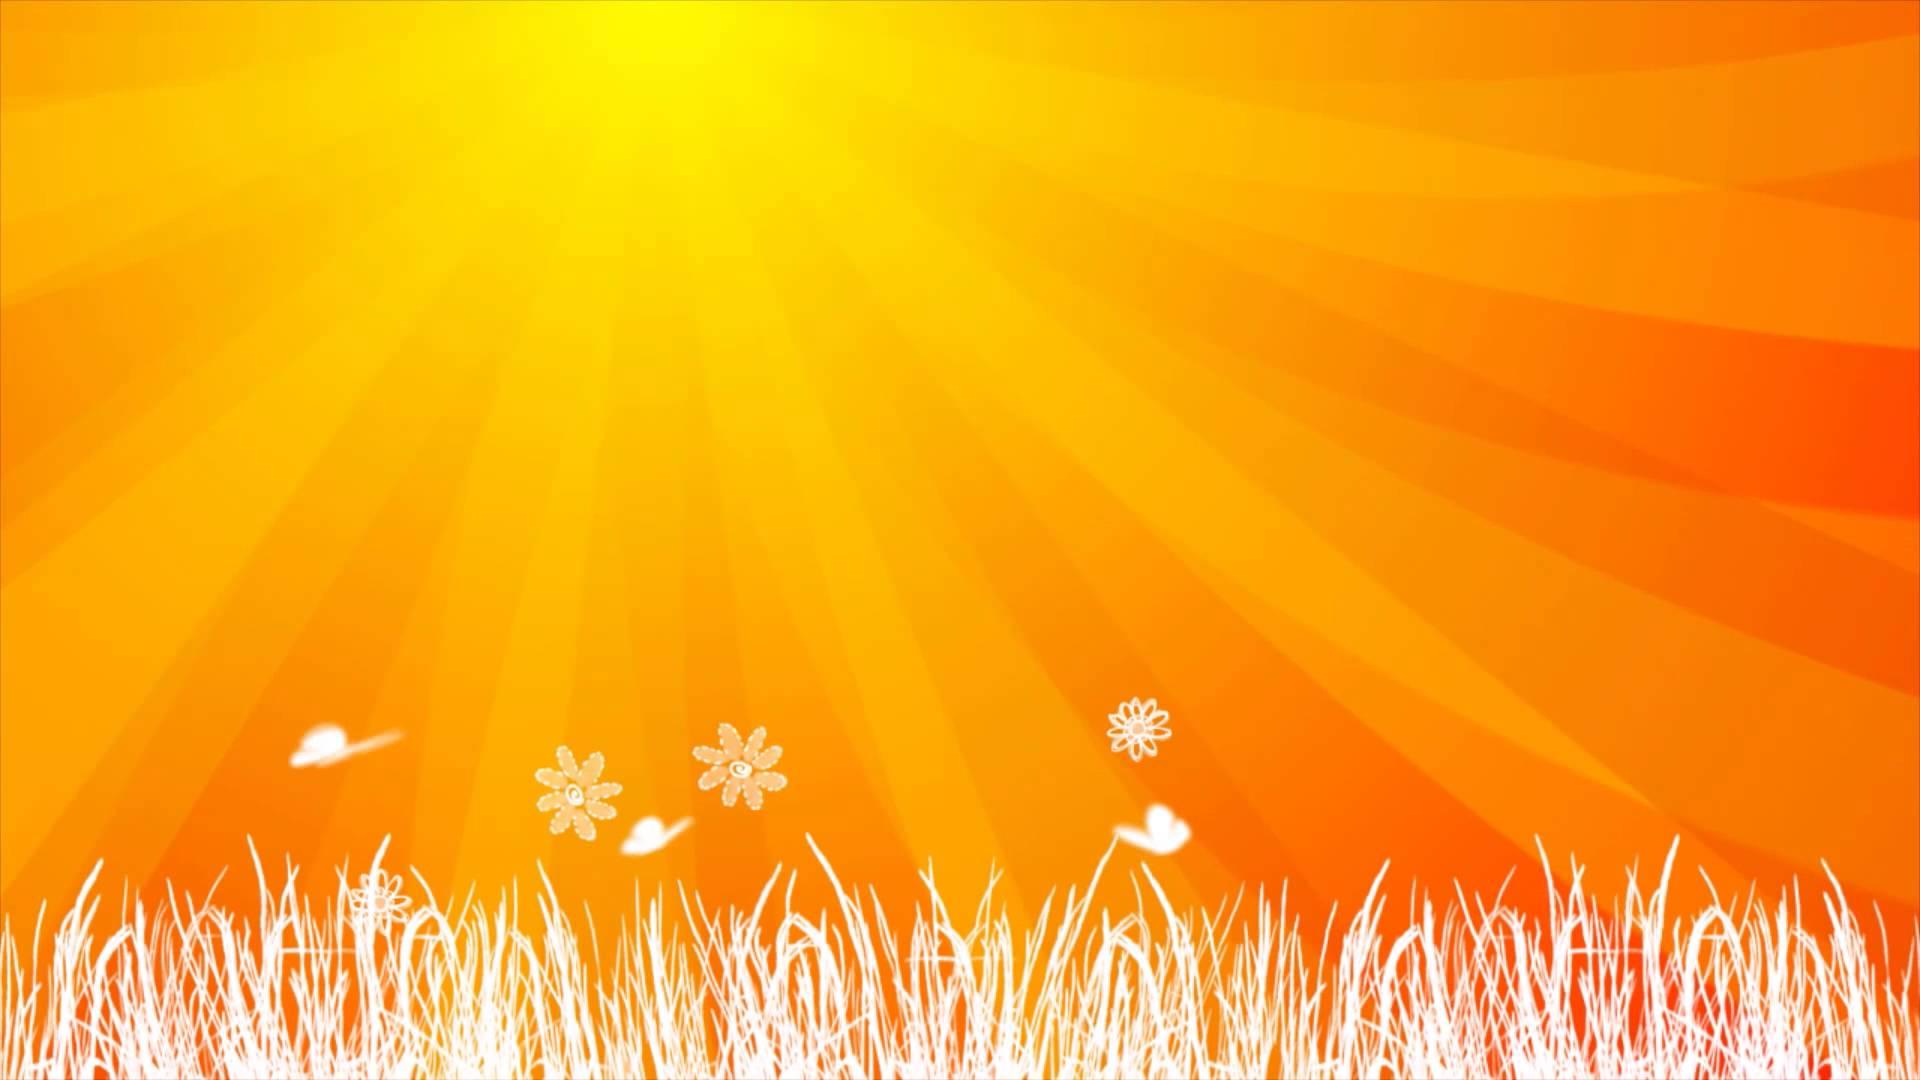 Good Morning Animation Wallpaper Sun Background High Definition Wallpaper 14580 Baltana